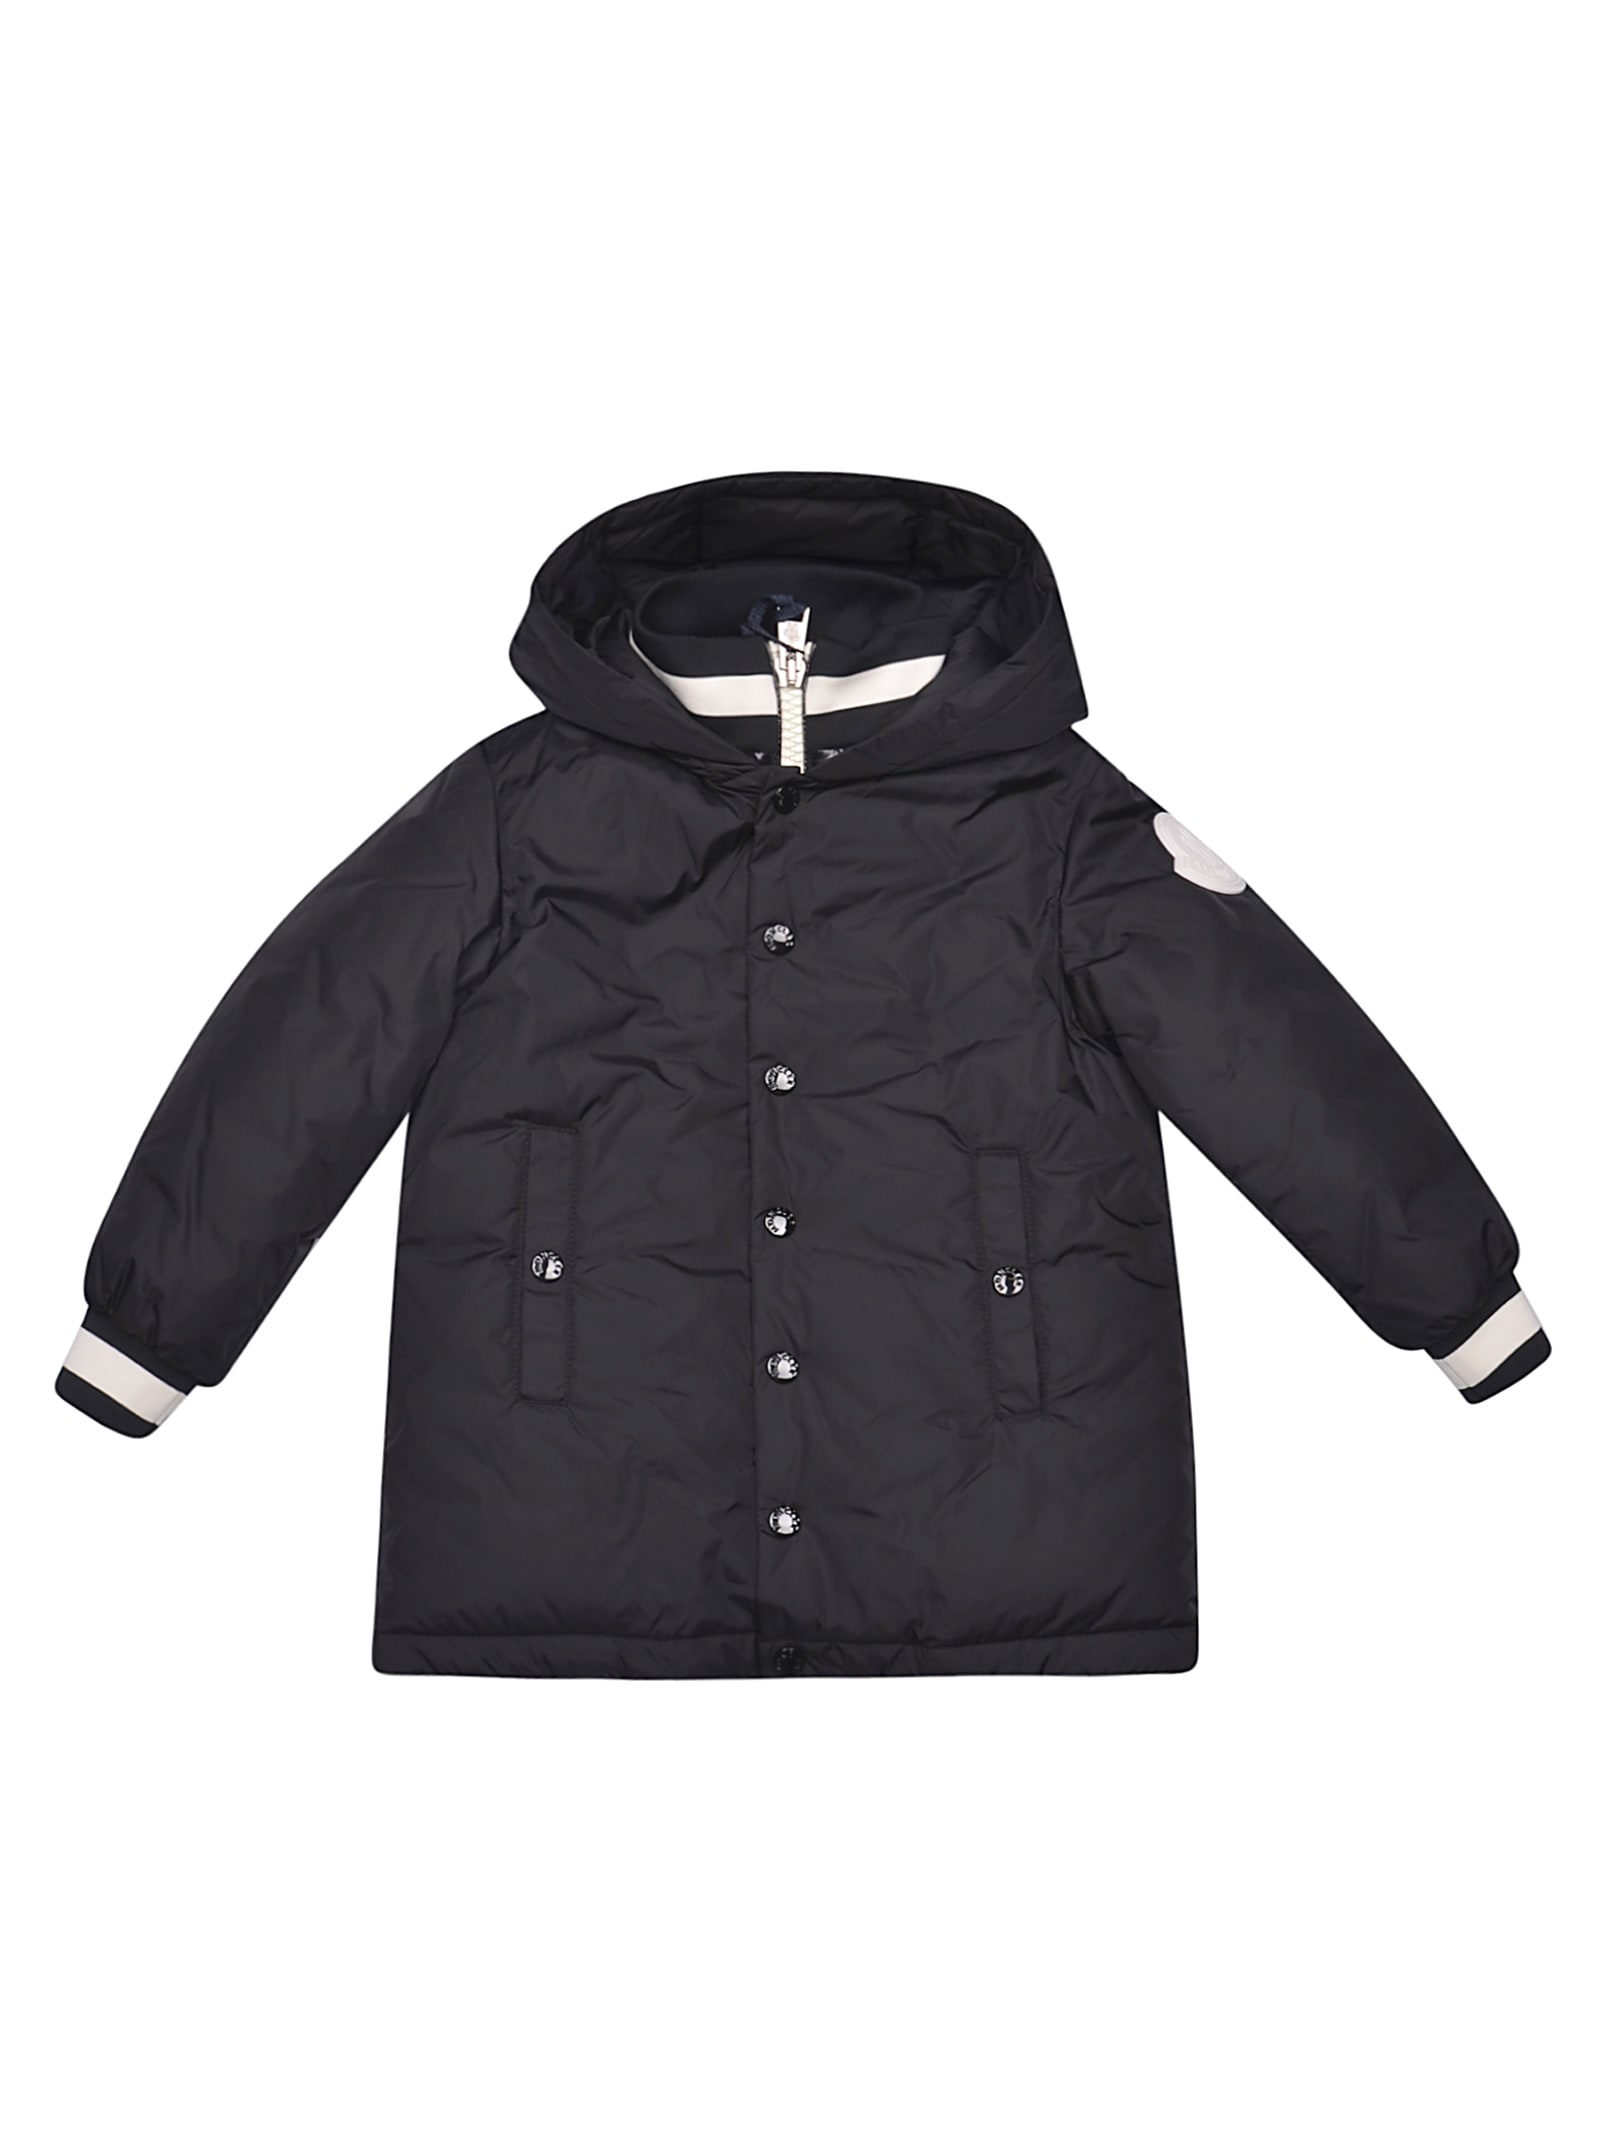 Moncler Kids' Thau Jacket In Nero